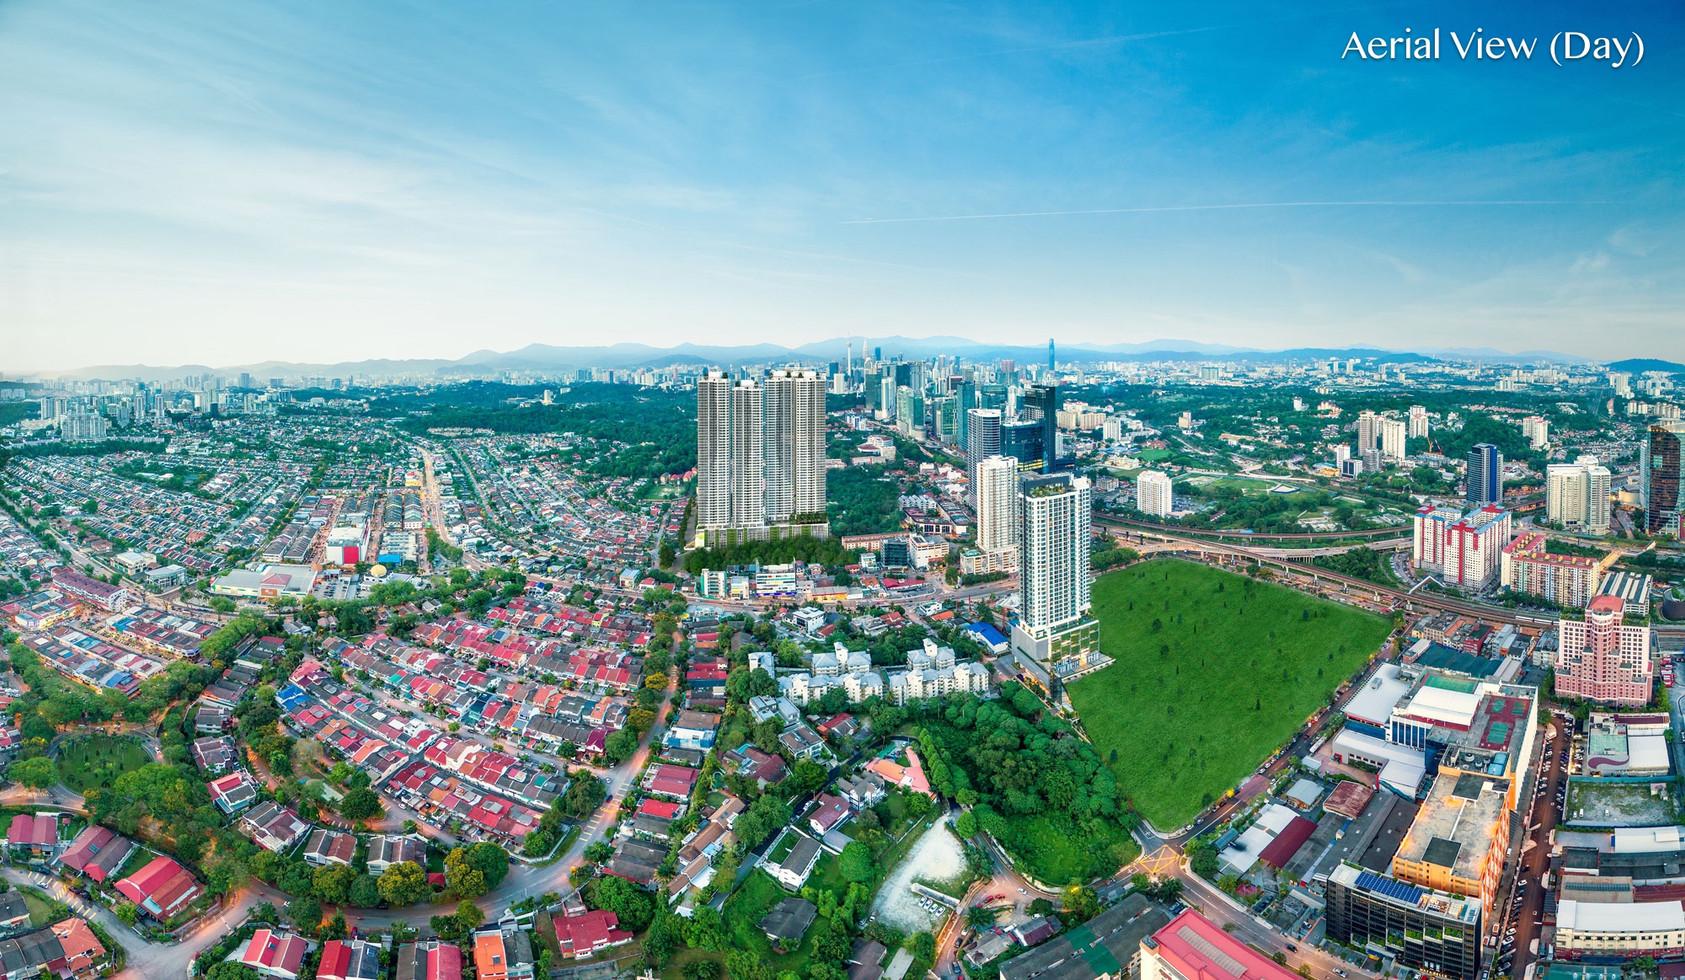 Bangsar Hill Park Aerial Day.jpg